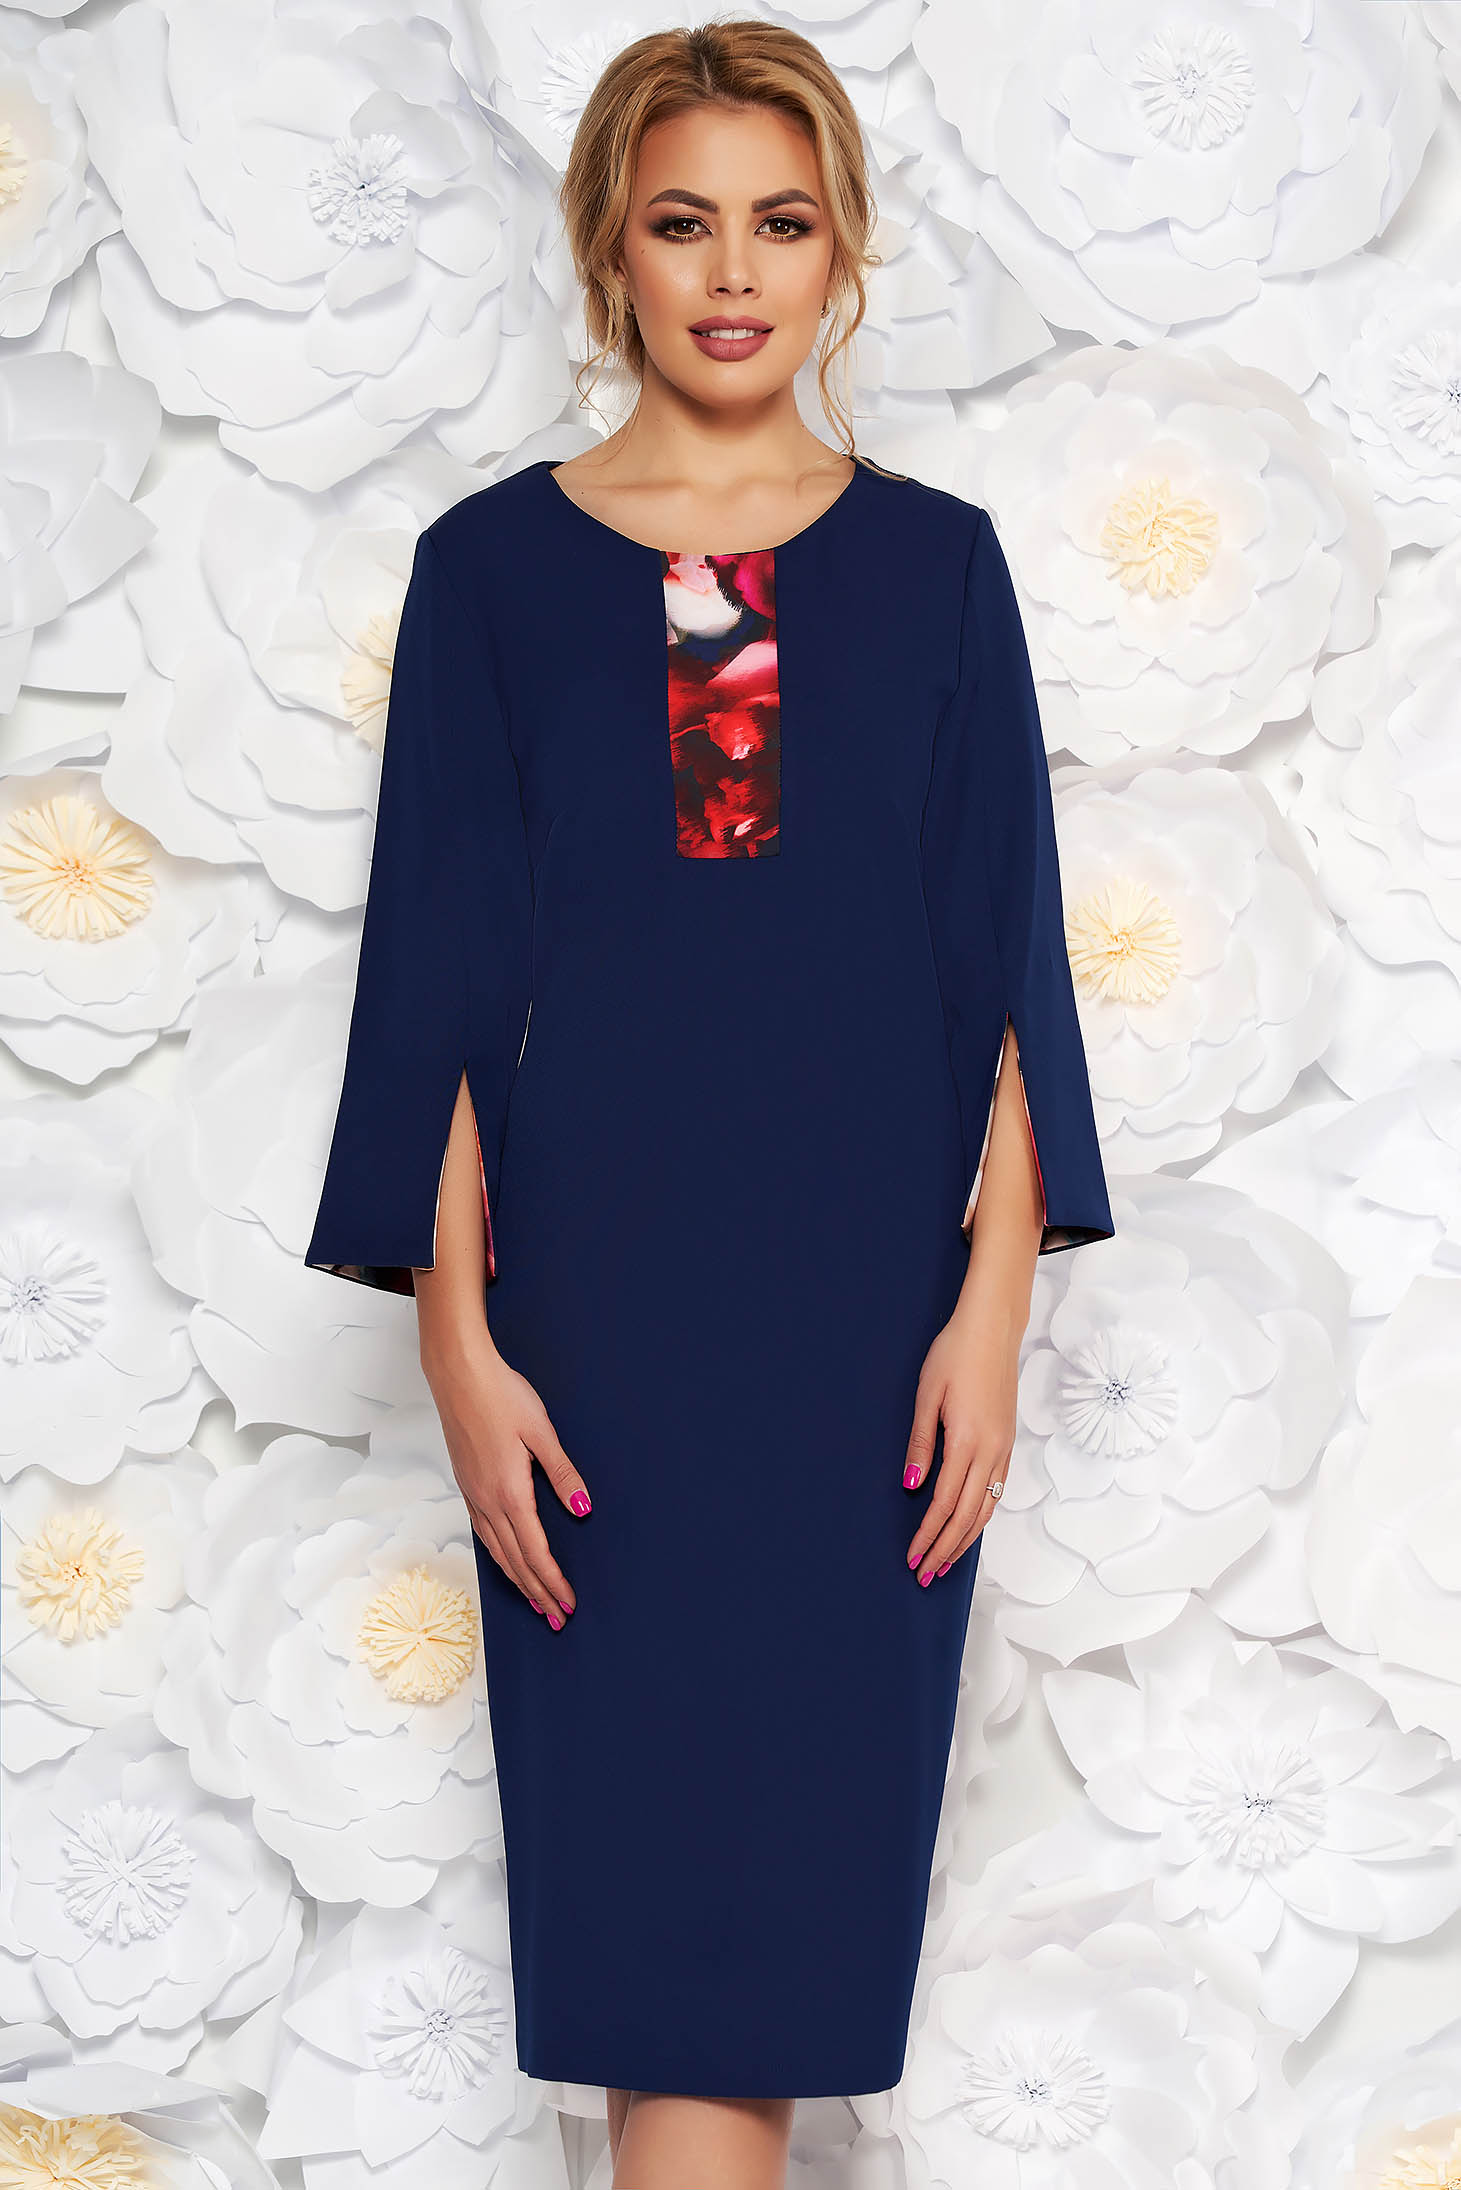 Rochie albastru-inchis eleganta tip creion cu maneca 3/4 din stofa subtire usor elastica